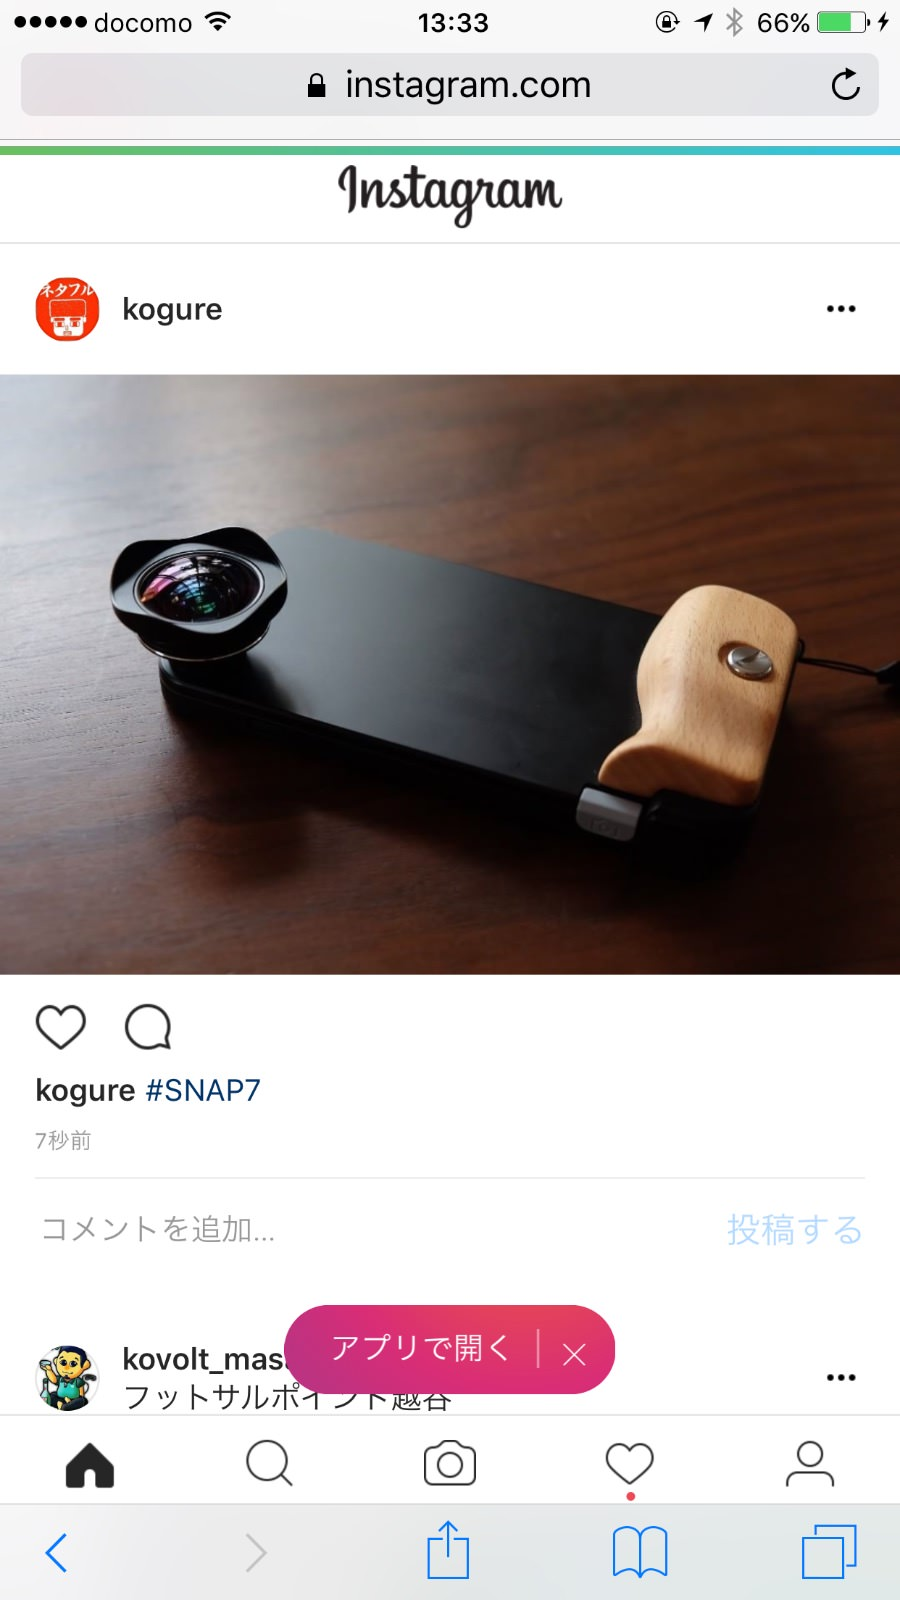 Instagram post 0731